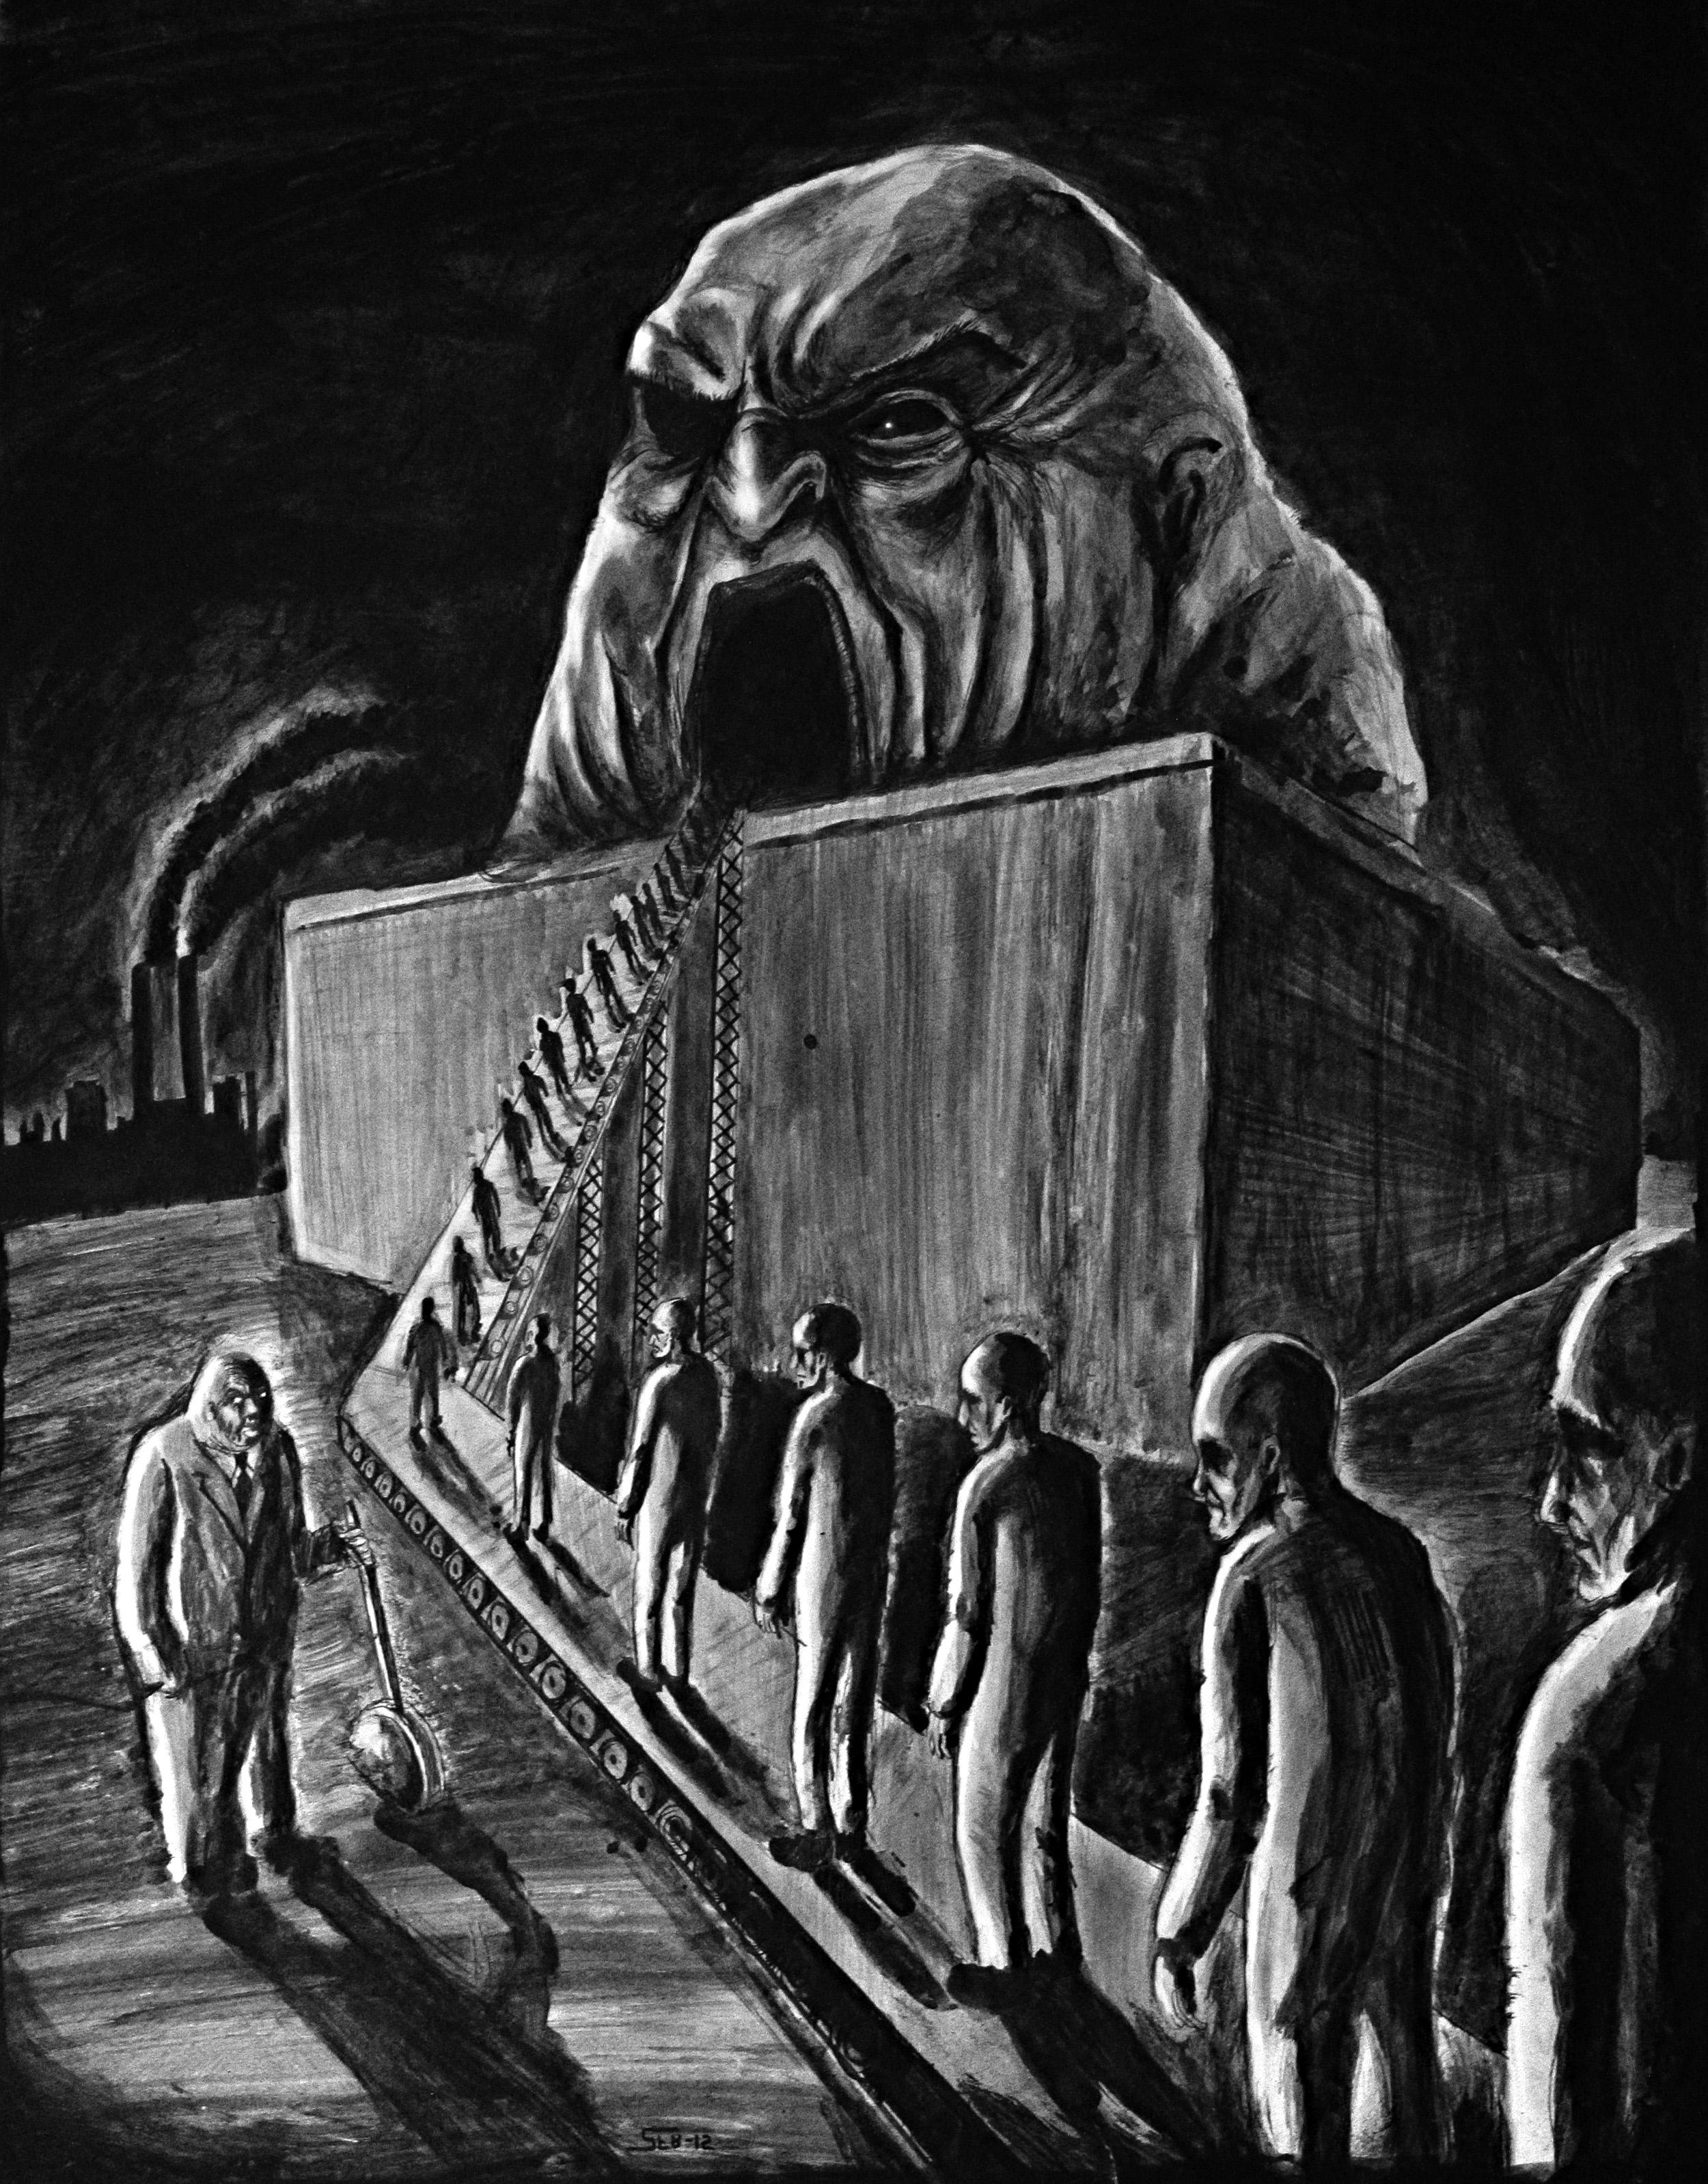 Society by Sebmaestro